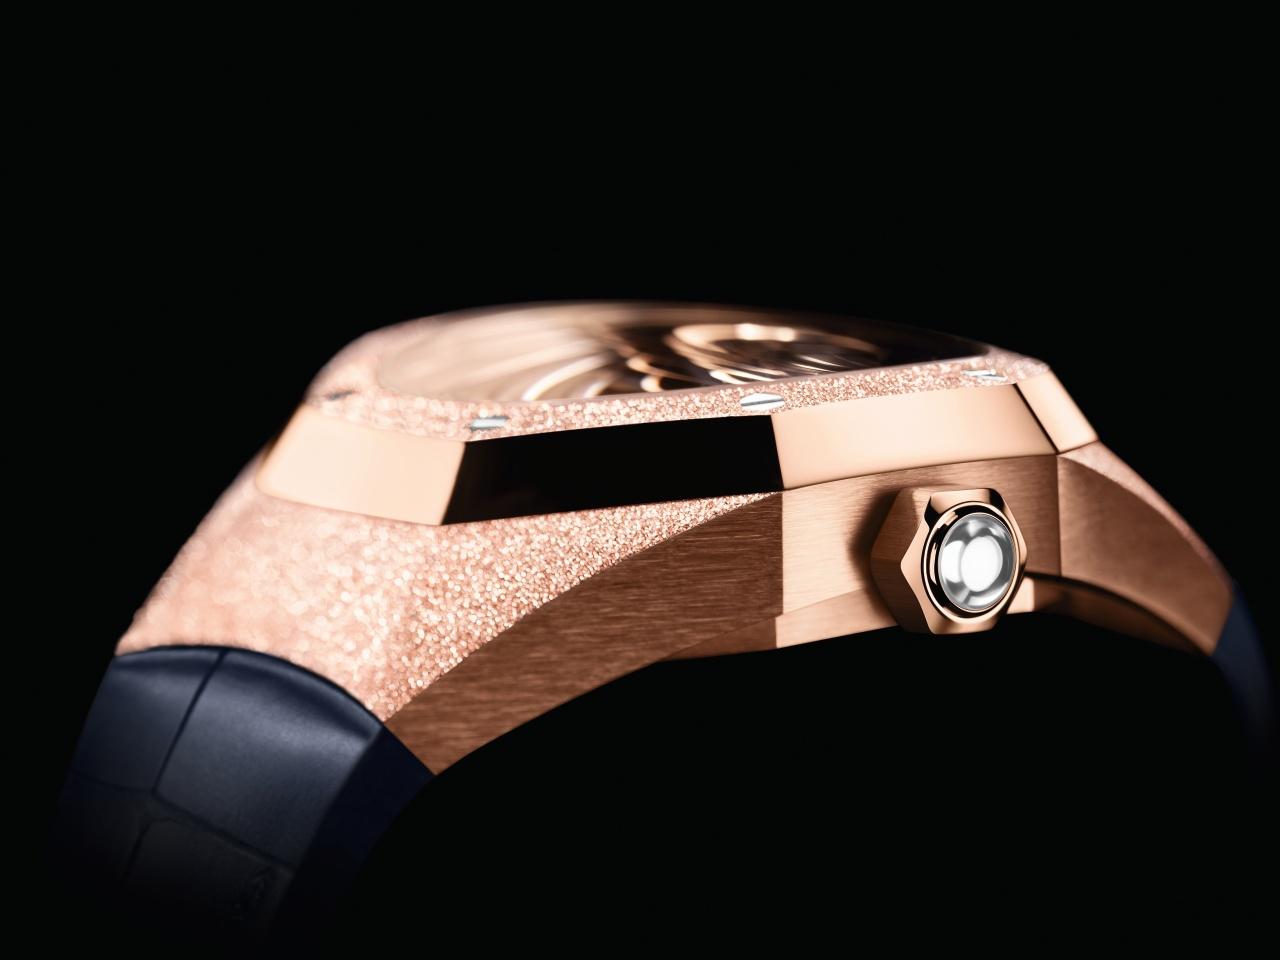 Audemars Piguet Royal Oak Concept Frosted Gold Flying Tourbillon